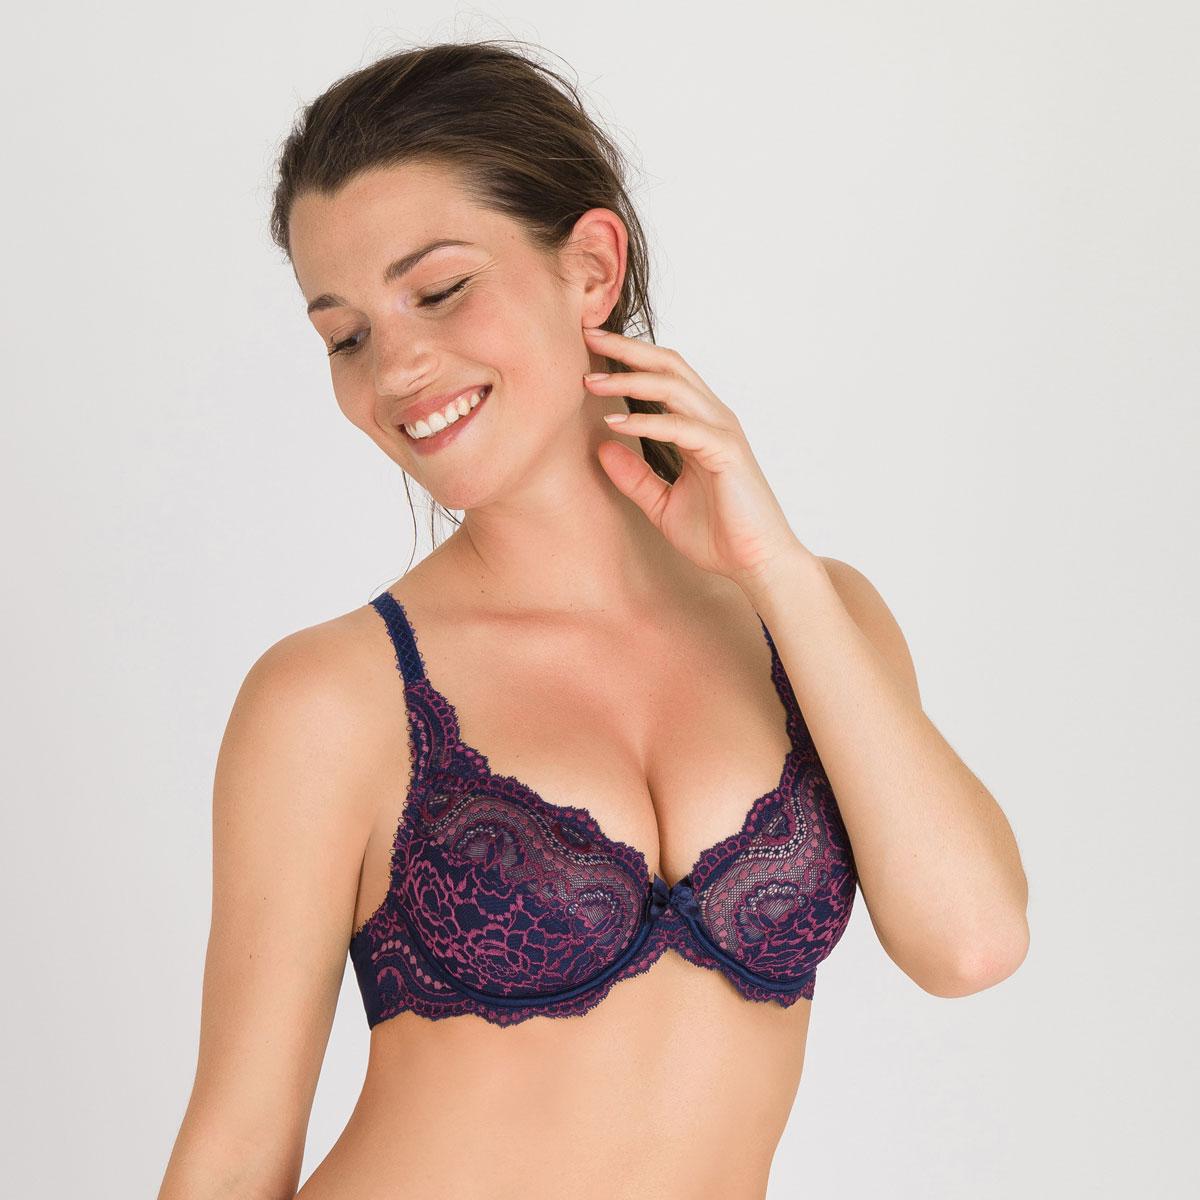 5049958088a Full Cup Bra in Dark Blue Purple - Flower Elegance